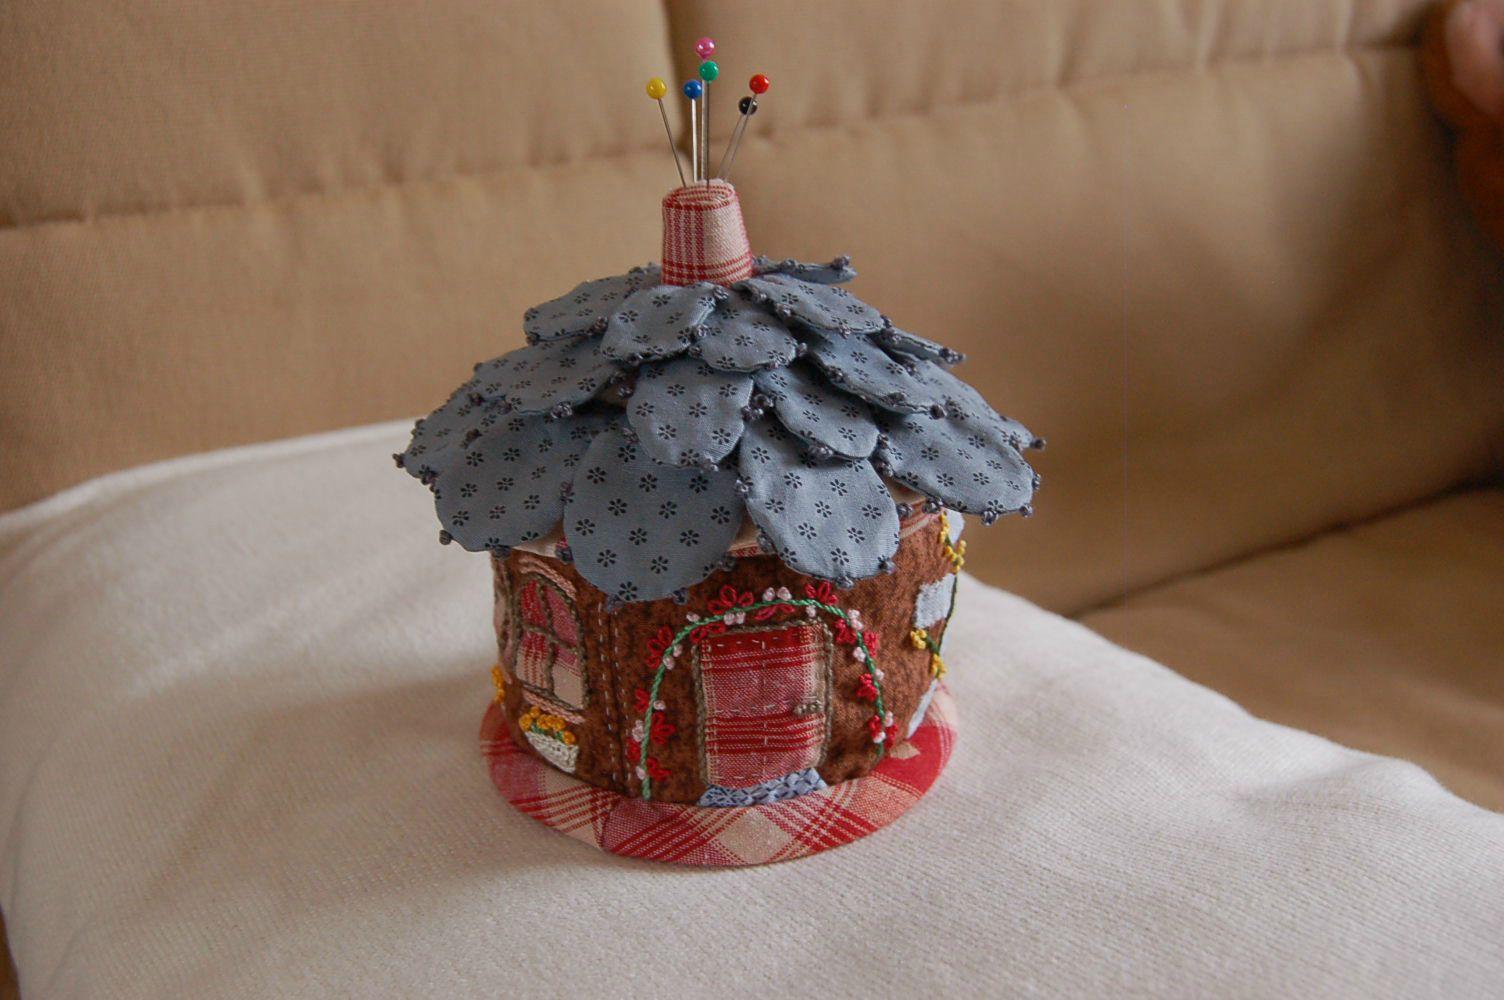 Ma petite maison mod le de reiko kato je brode on for Modele de petite maison